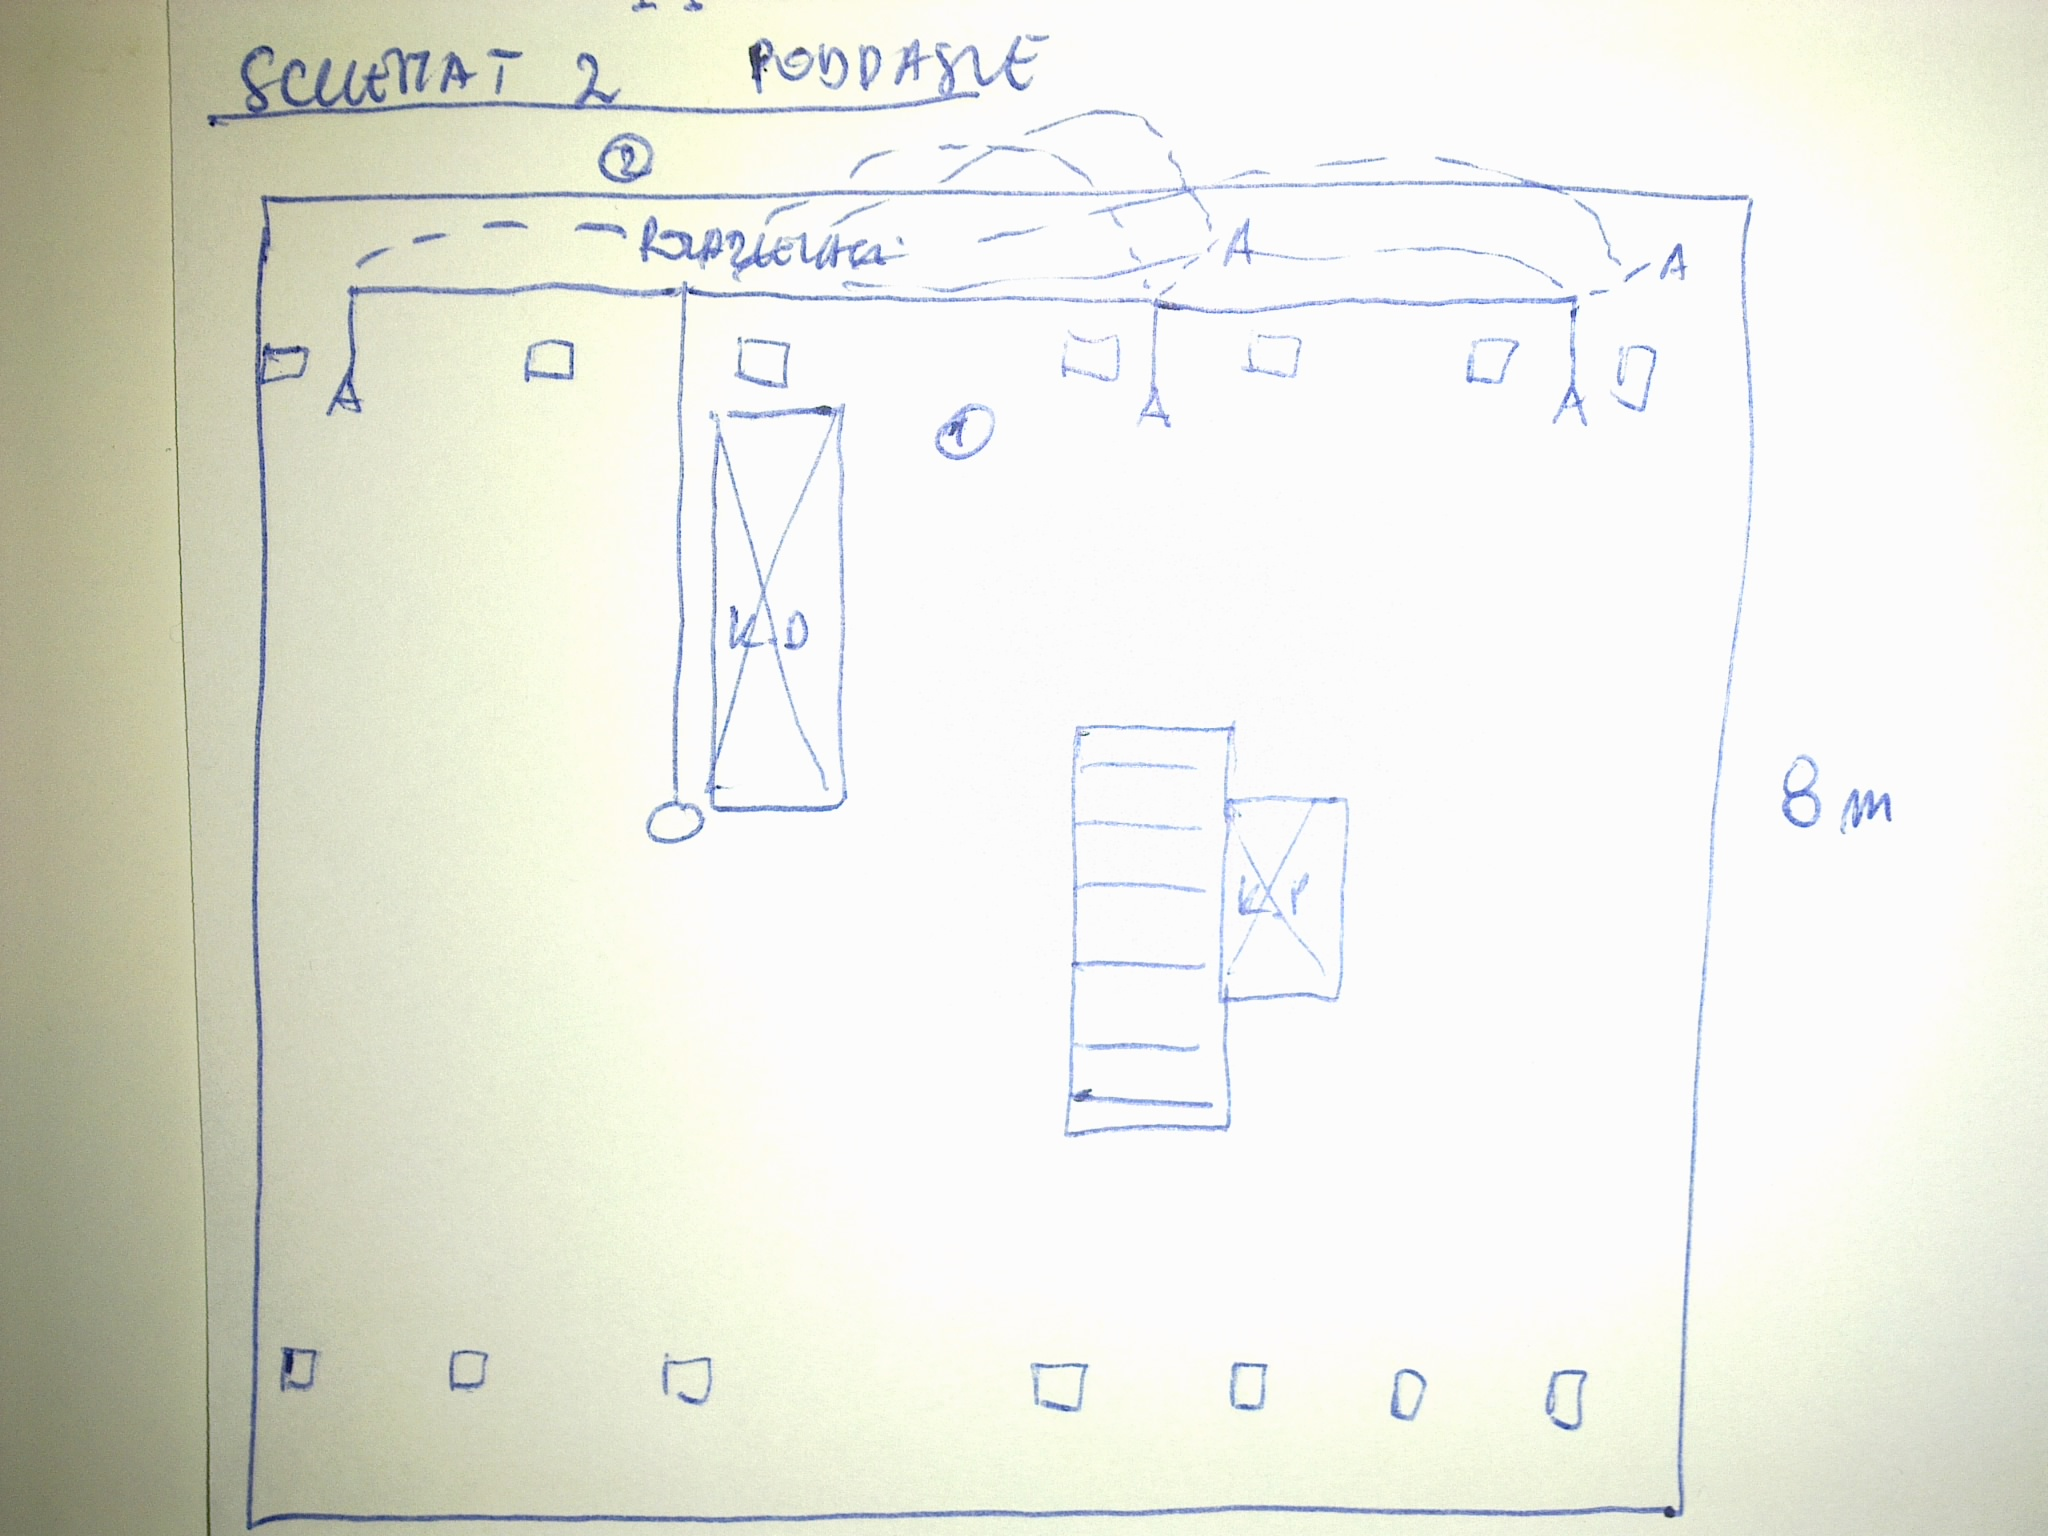 kominek+instalcja DGP schemat prosba o porade!